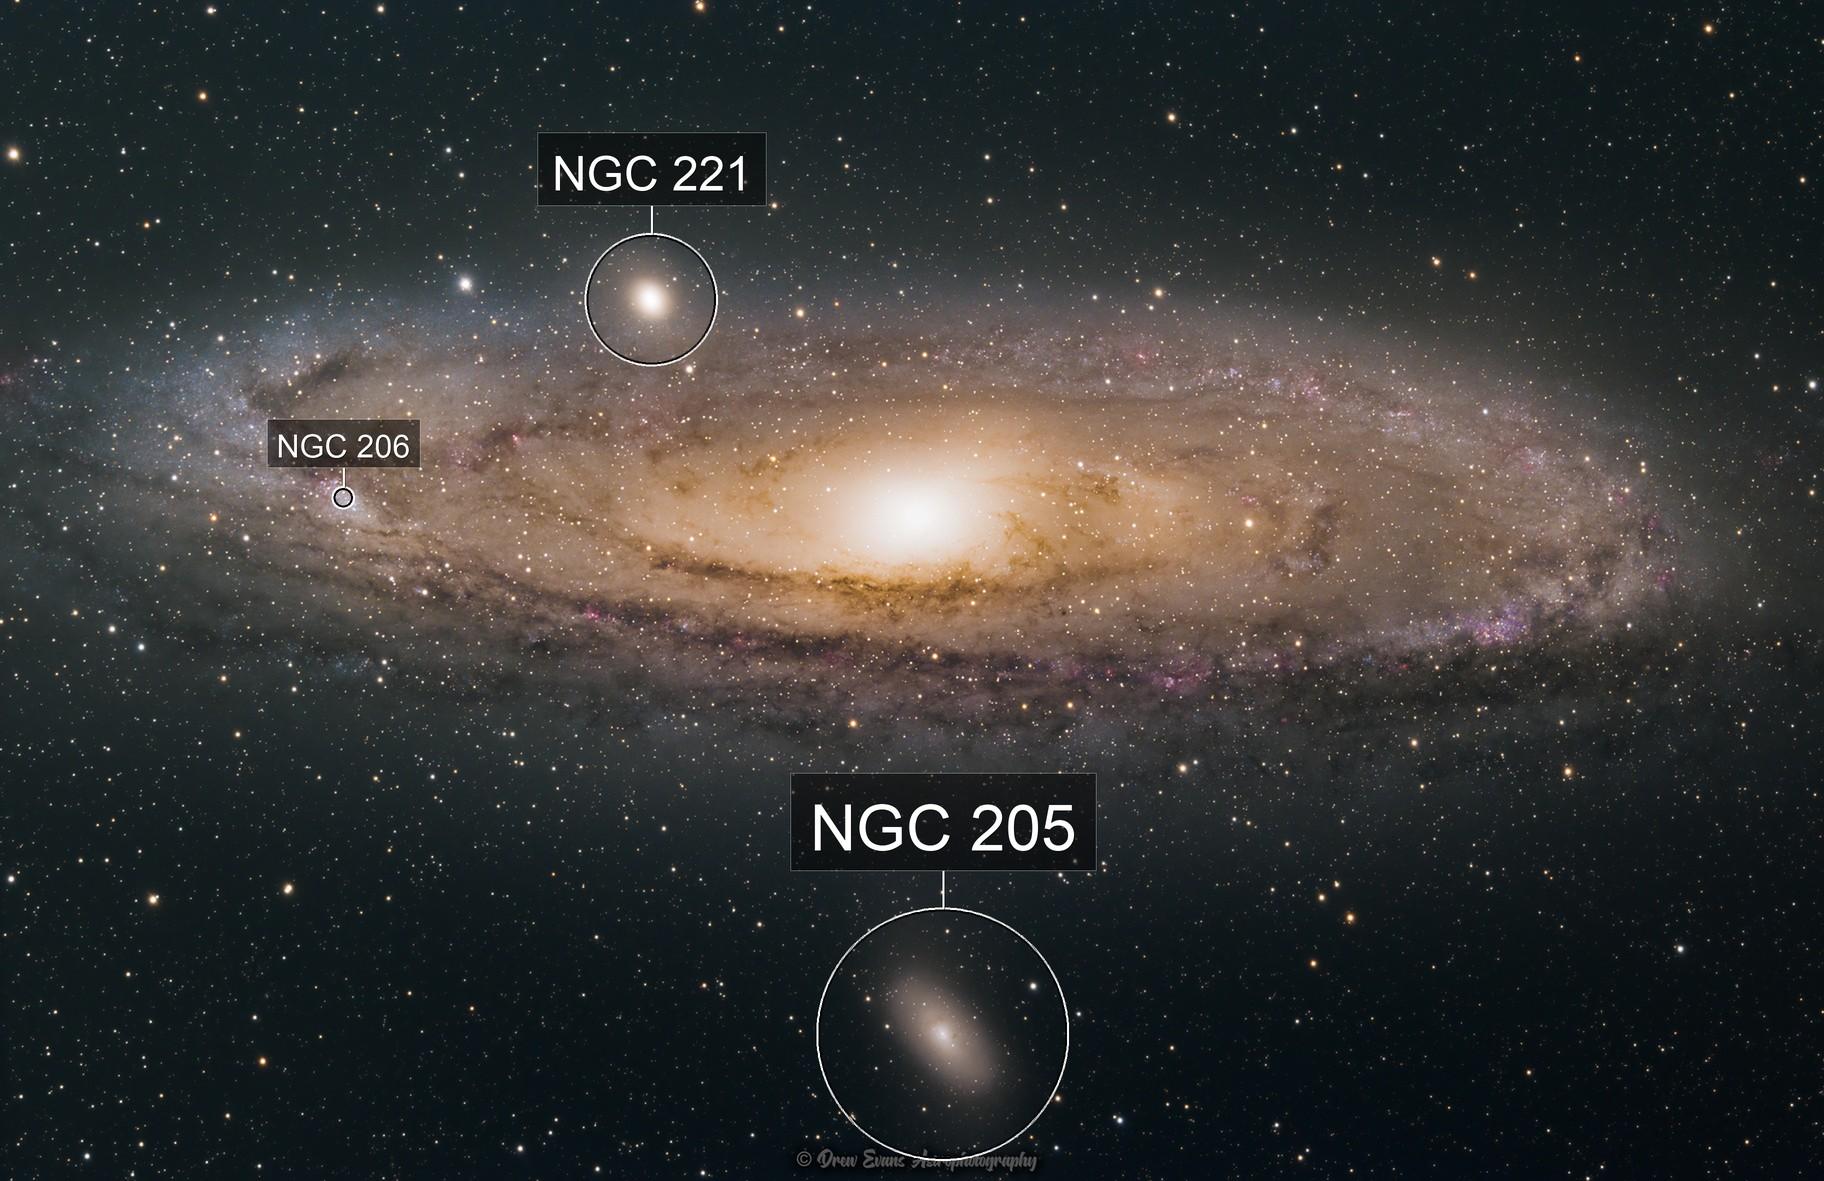 M31 - The Great Andromeda Galaxy